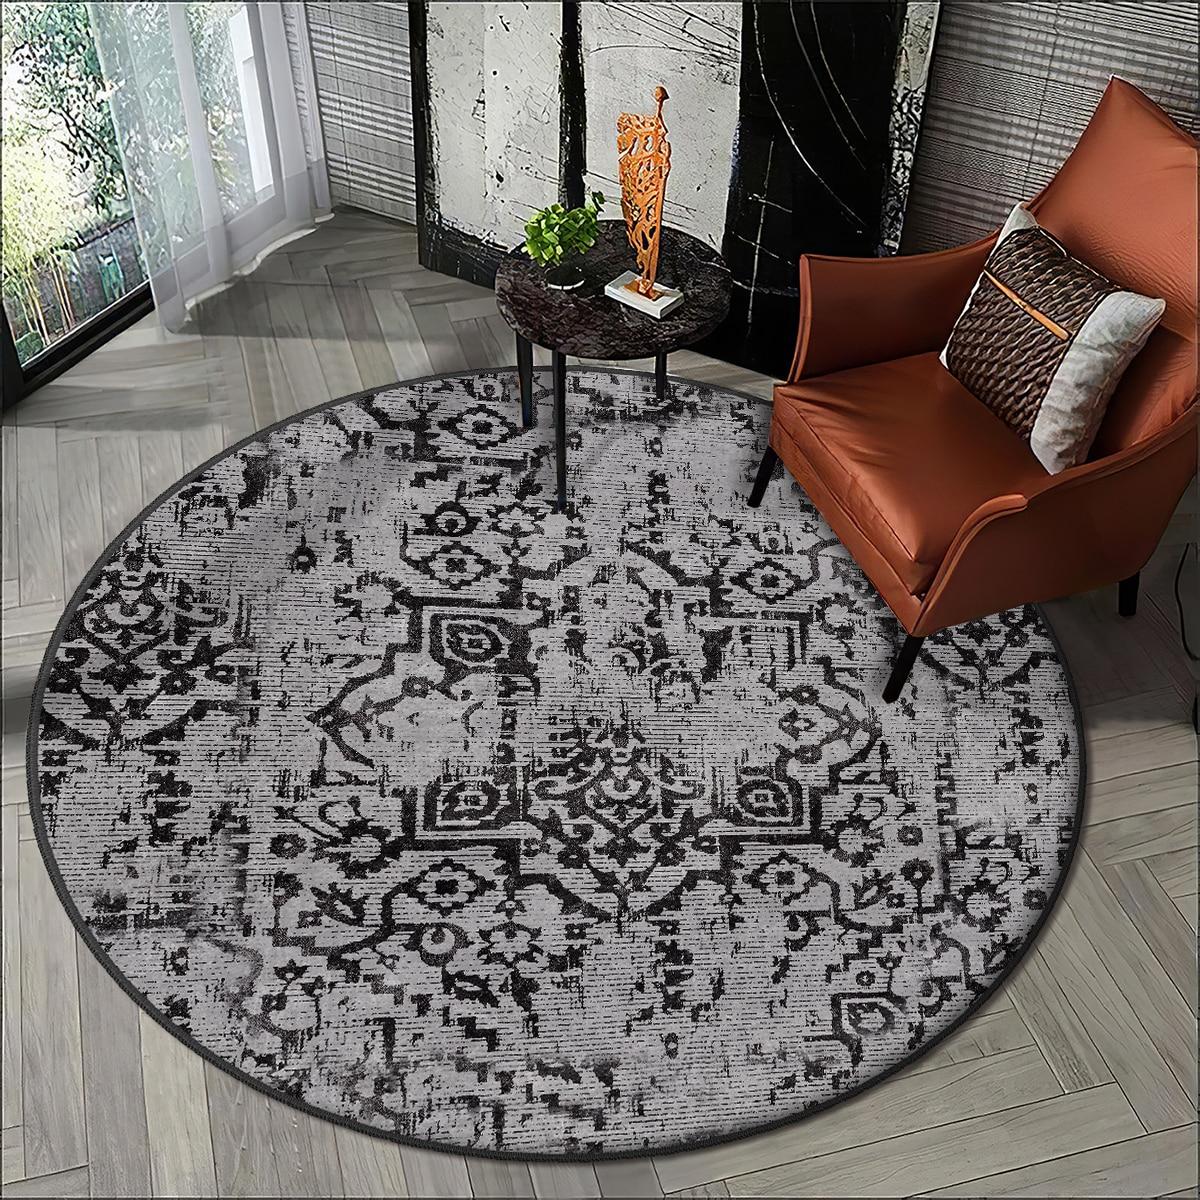 Mordern grey living room carpet kitchen round carpet room carpet black ethnic patterns anti allergic high quality Free Shipping